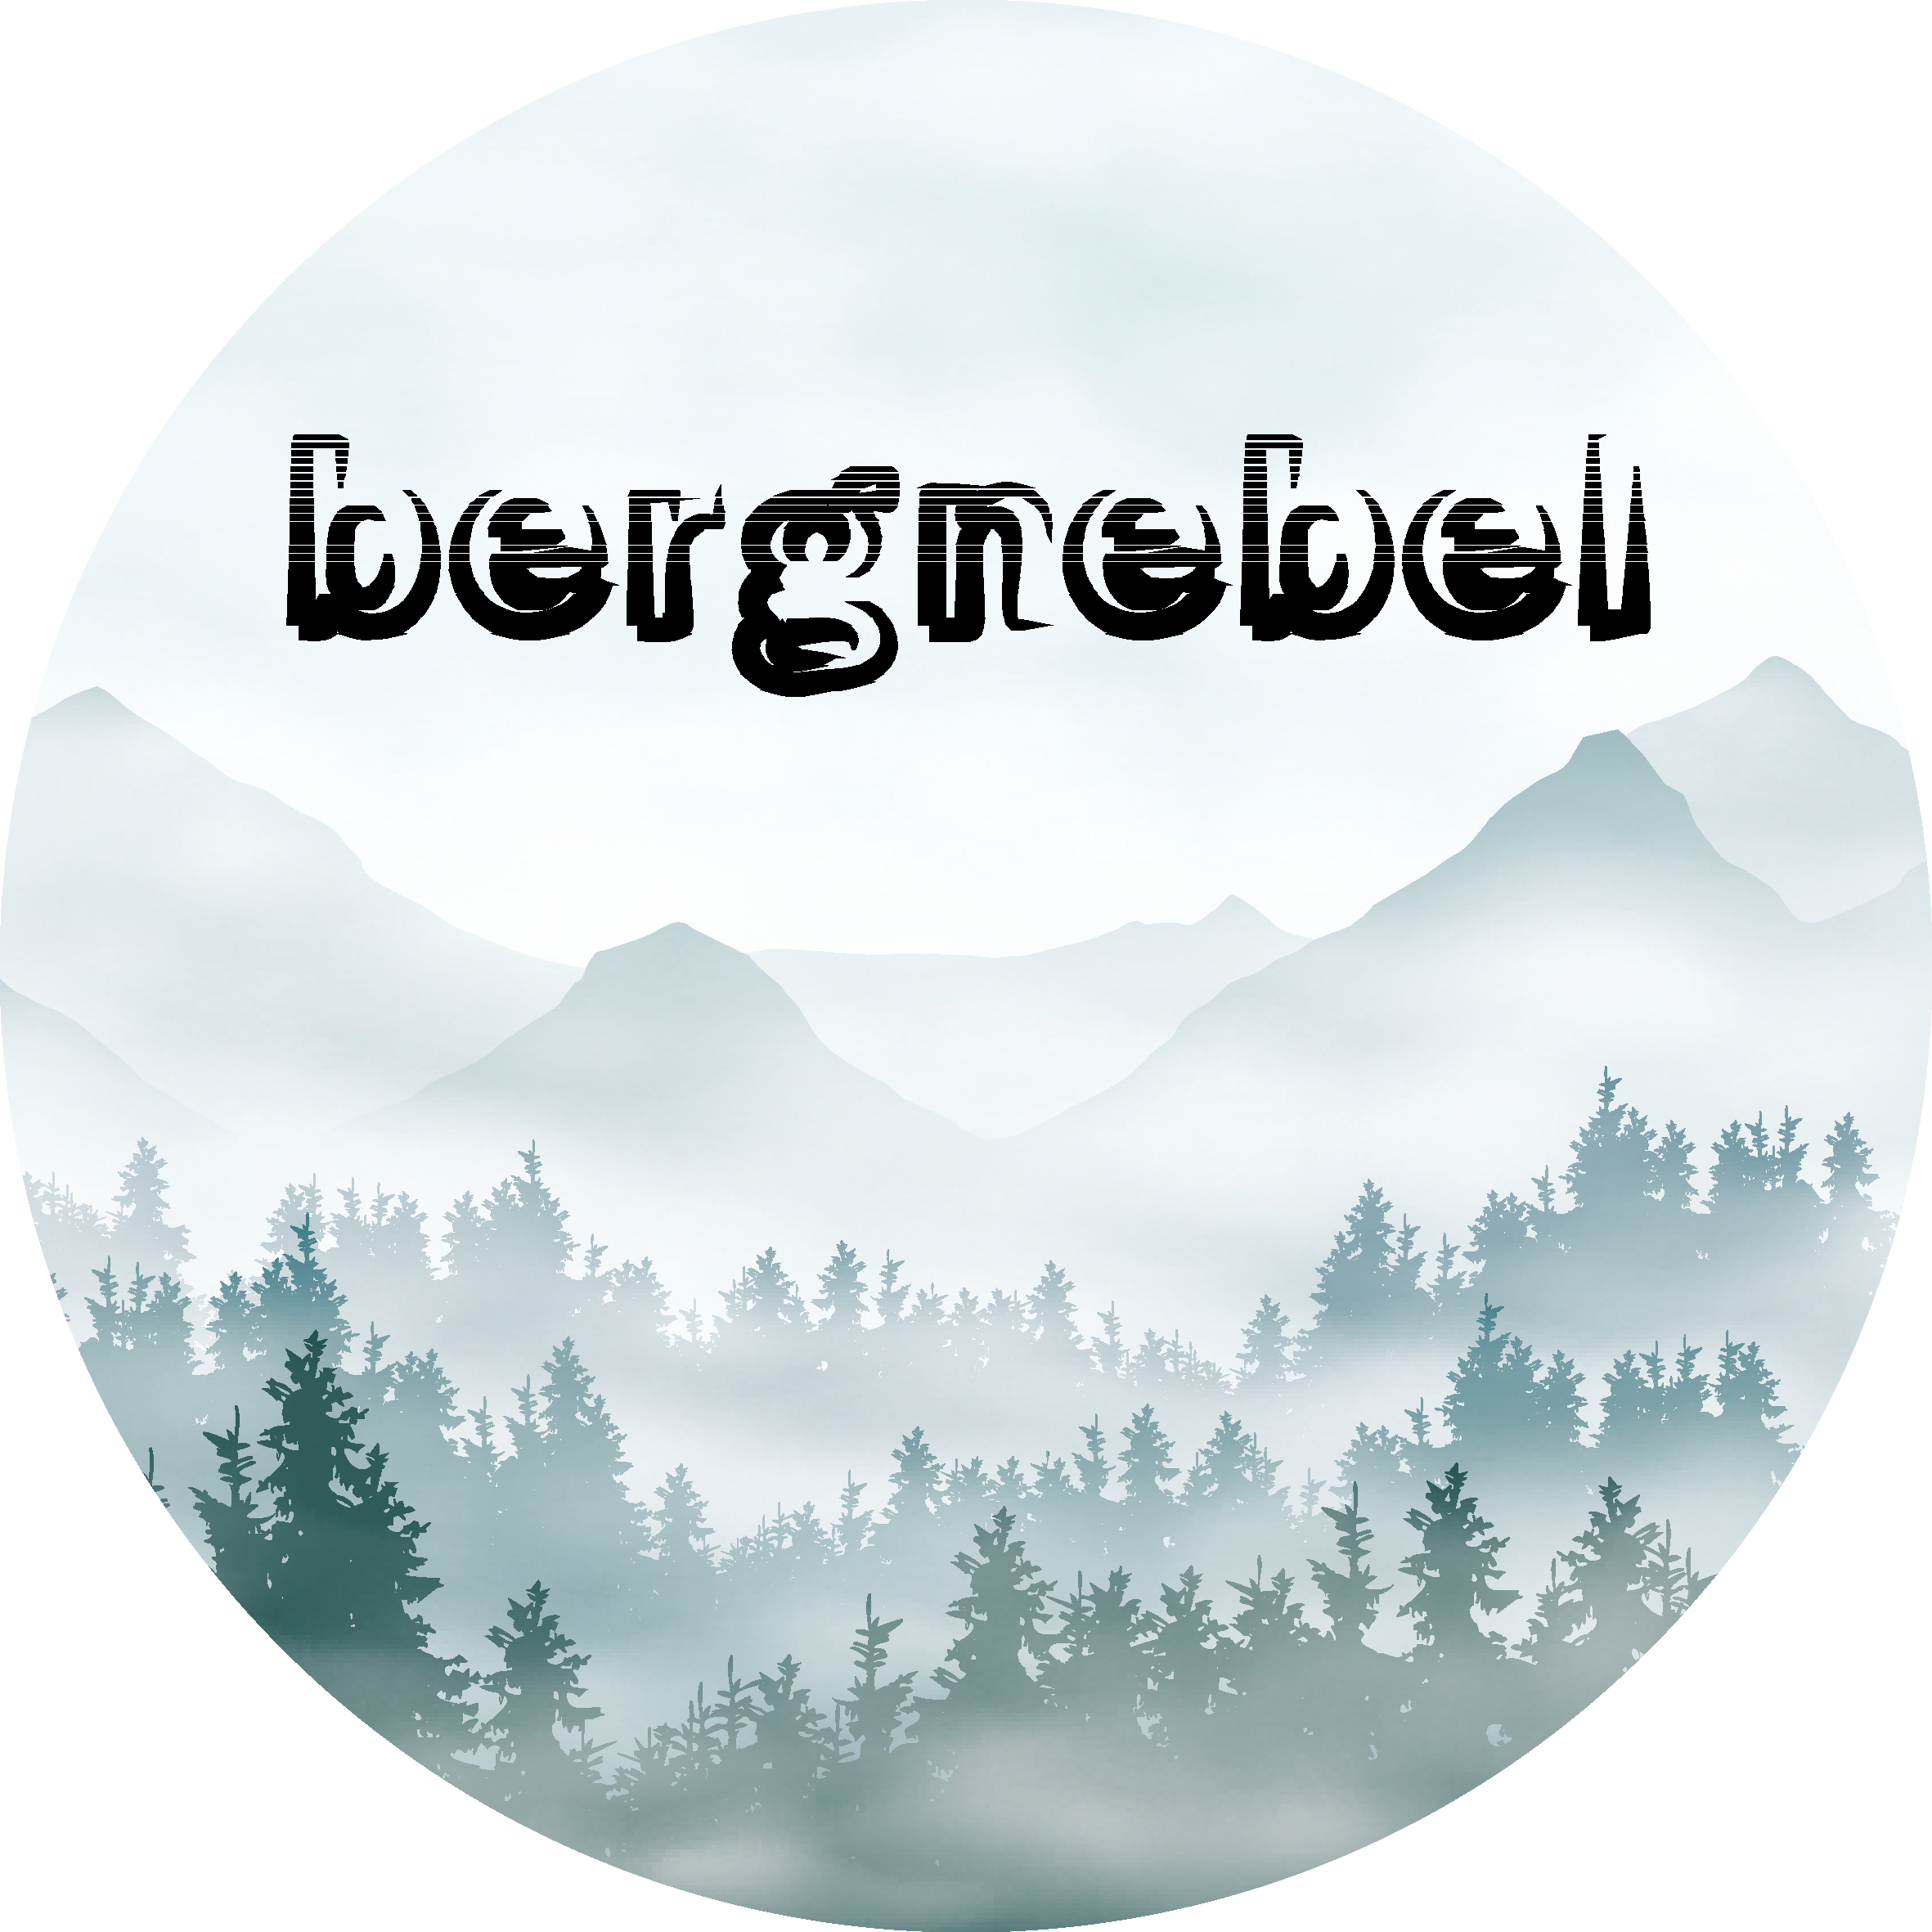 Bergnebel